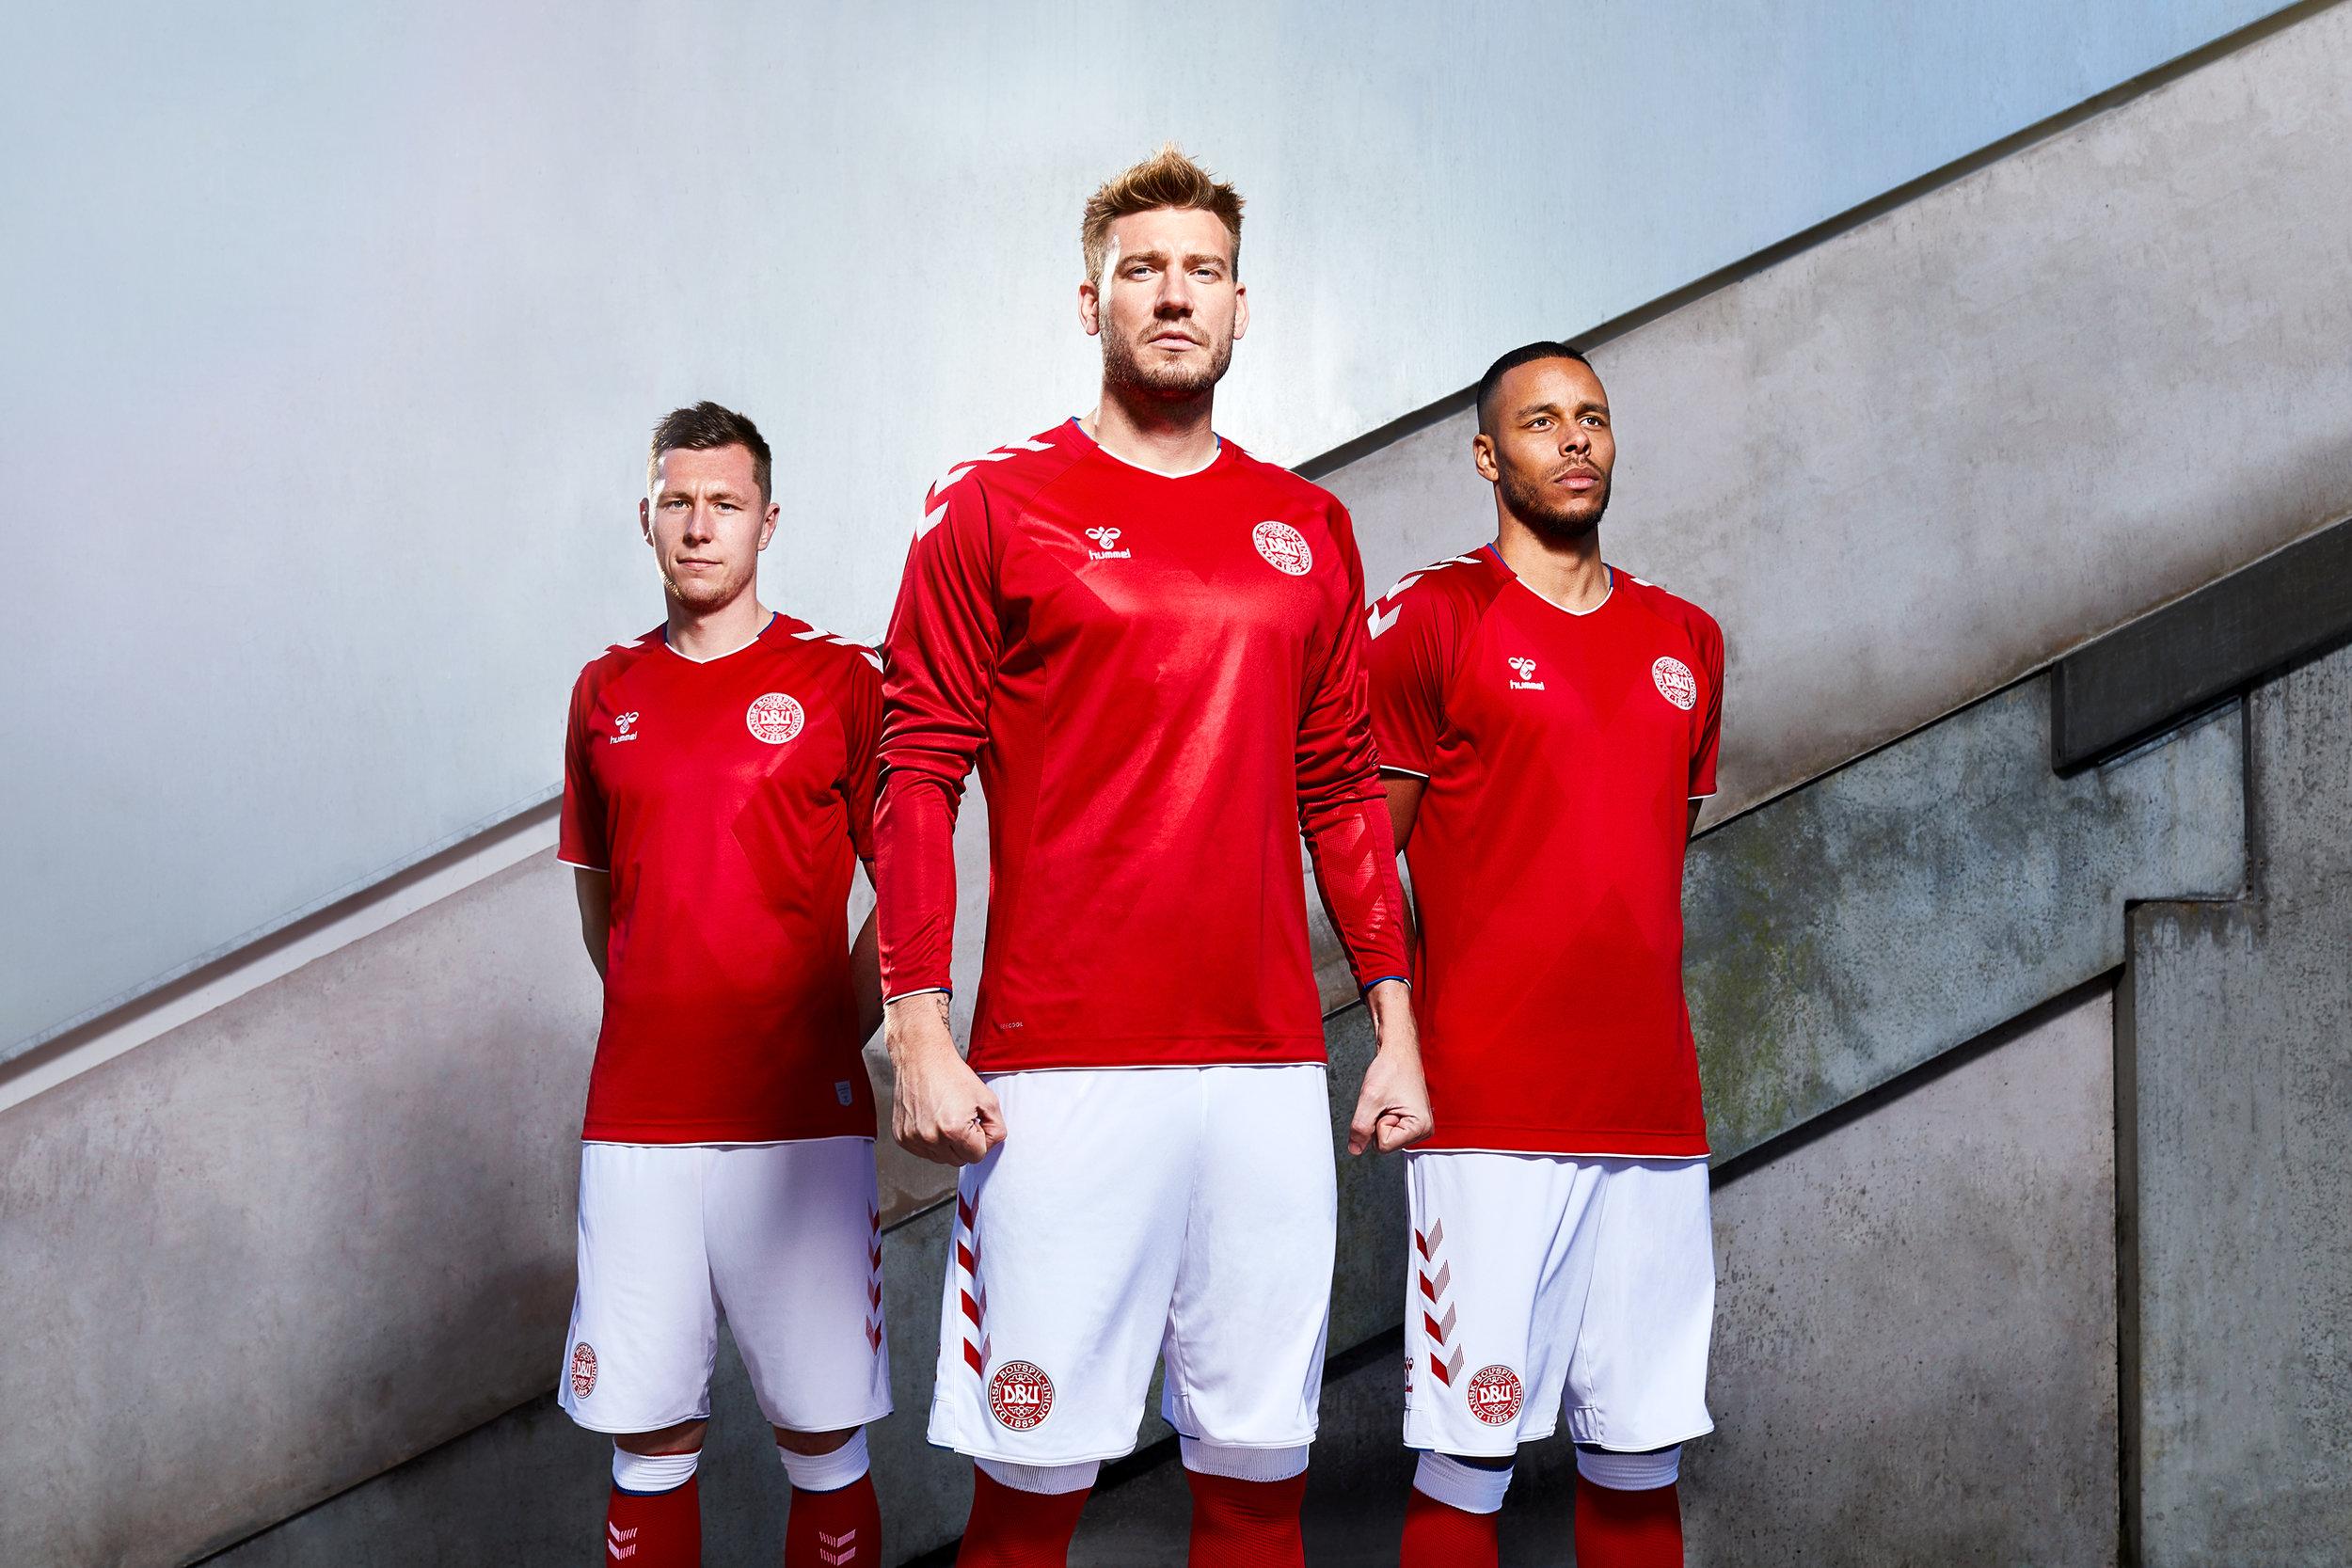 Danish National team - Hummel sports catalogue